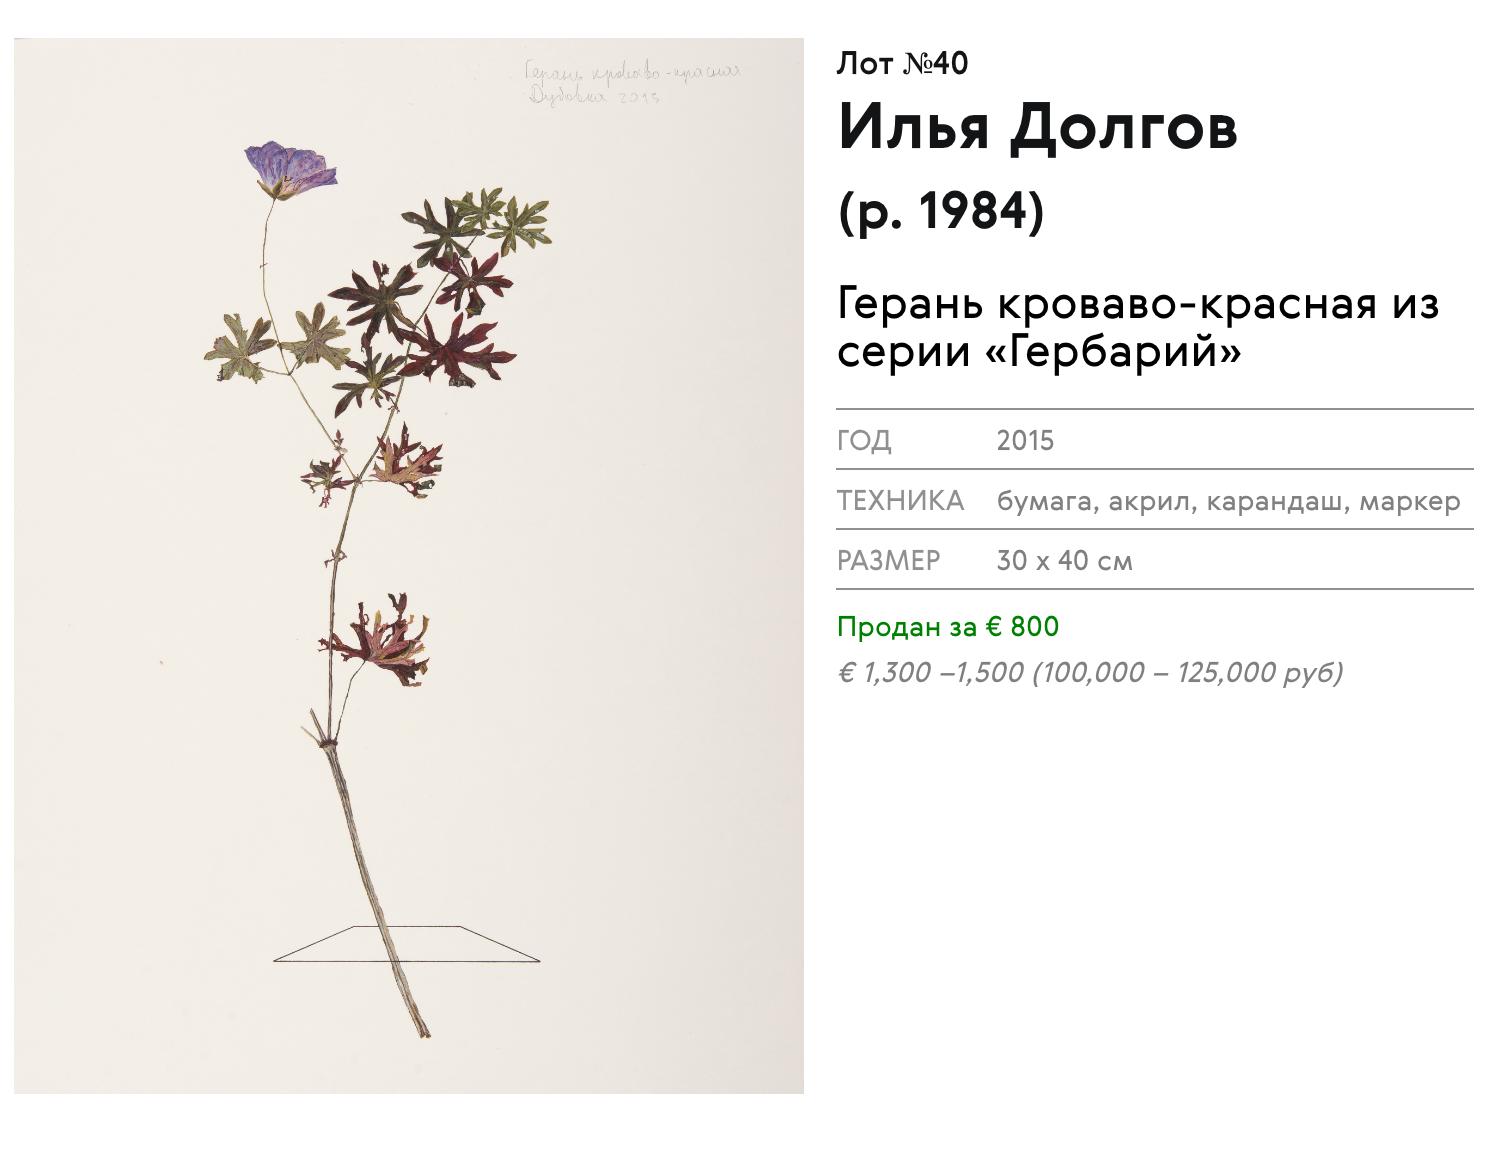 Серия «Гербарий» продаётся в московский галерее XL, цена за 1 лист — € 1100